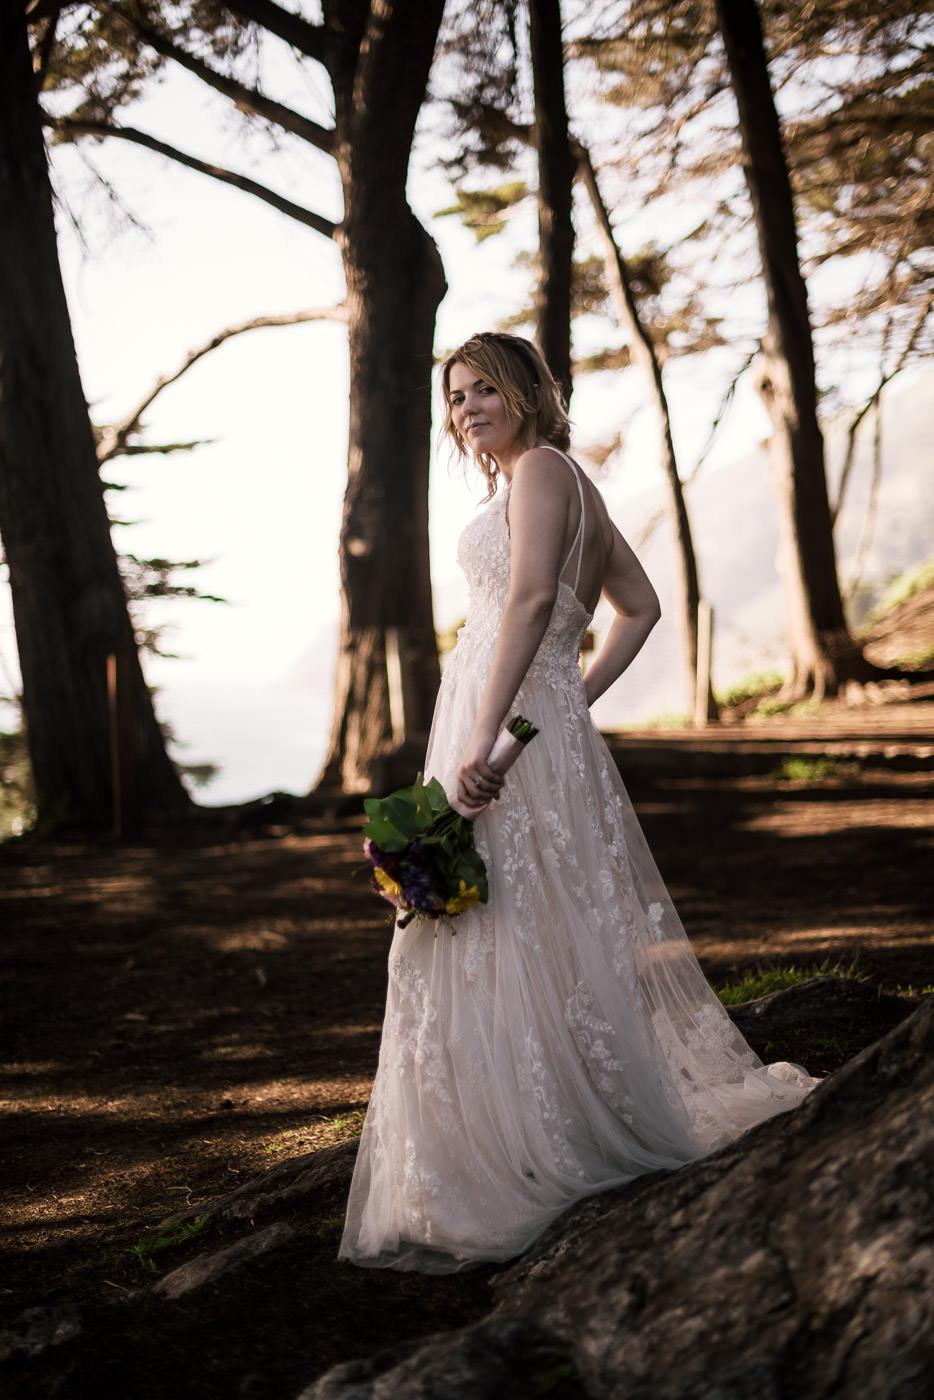 National Park elopement photographer creats a stunning portrait of a bride.